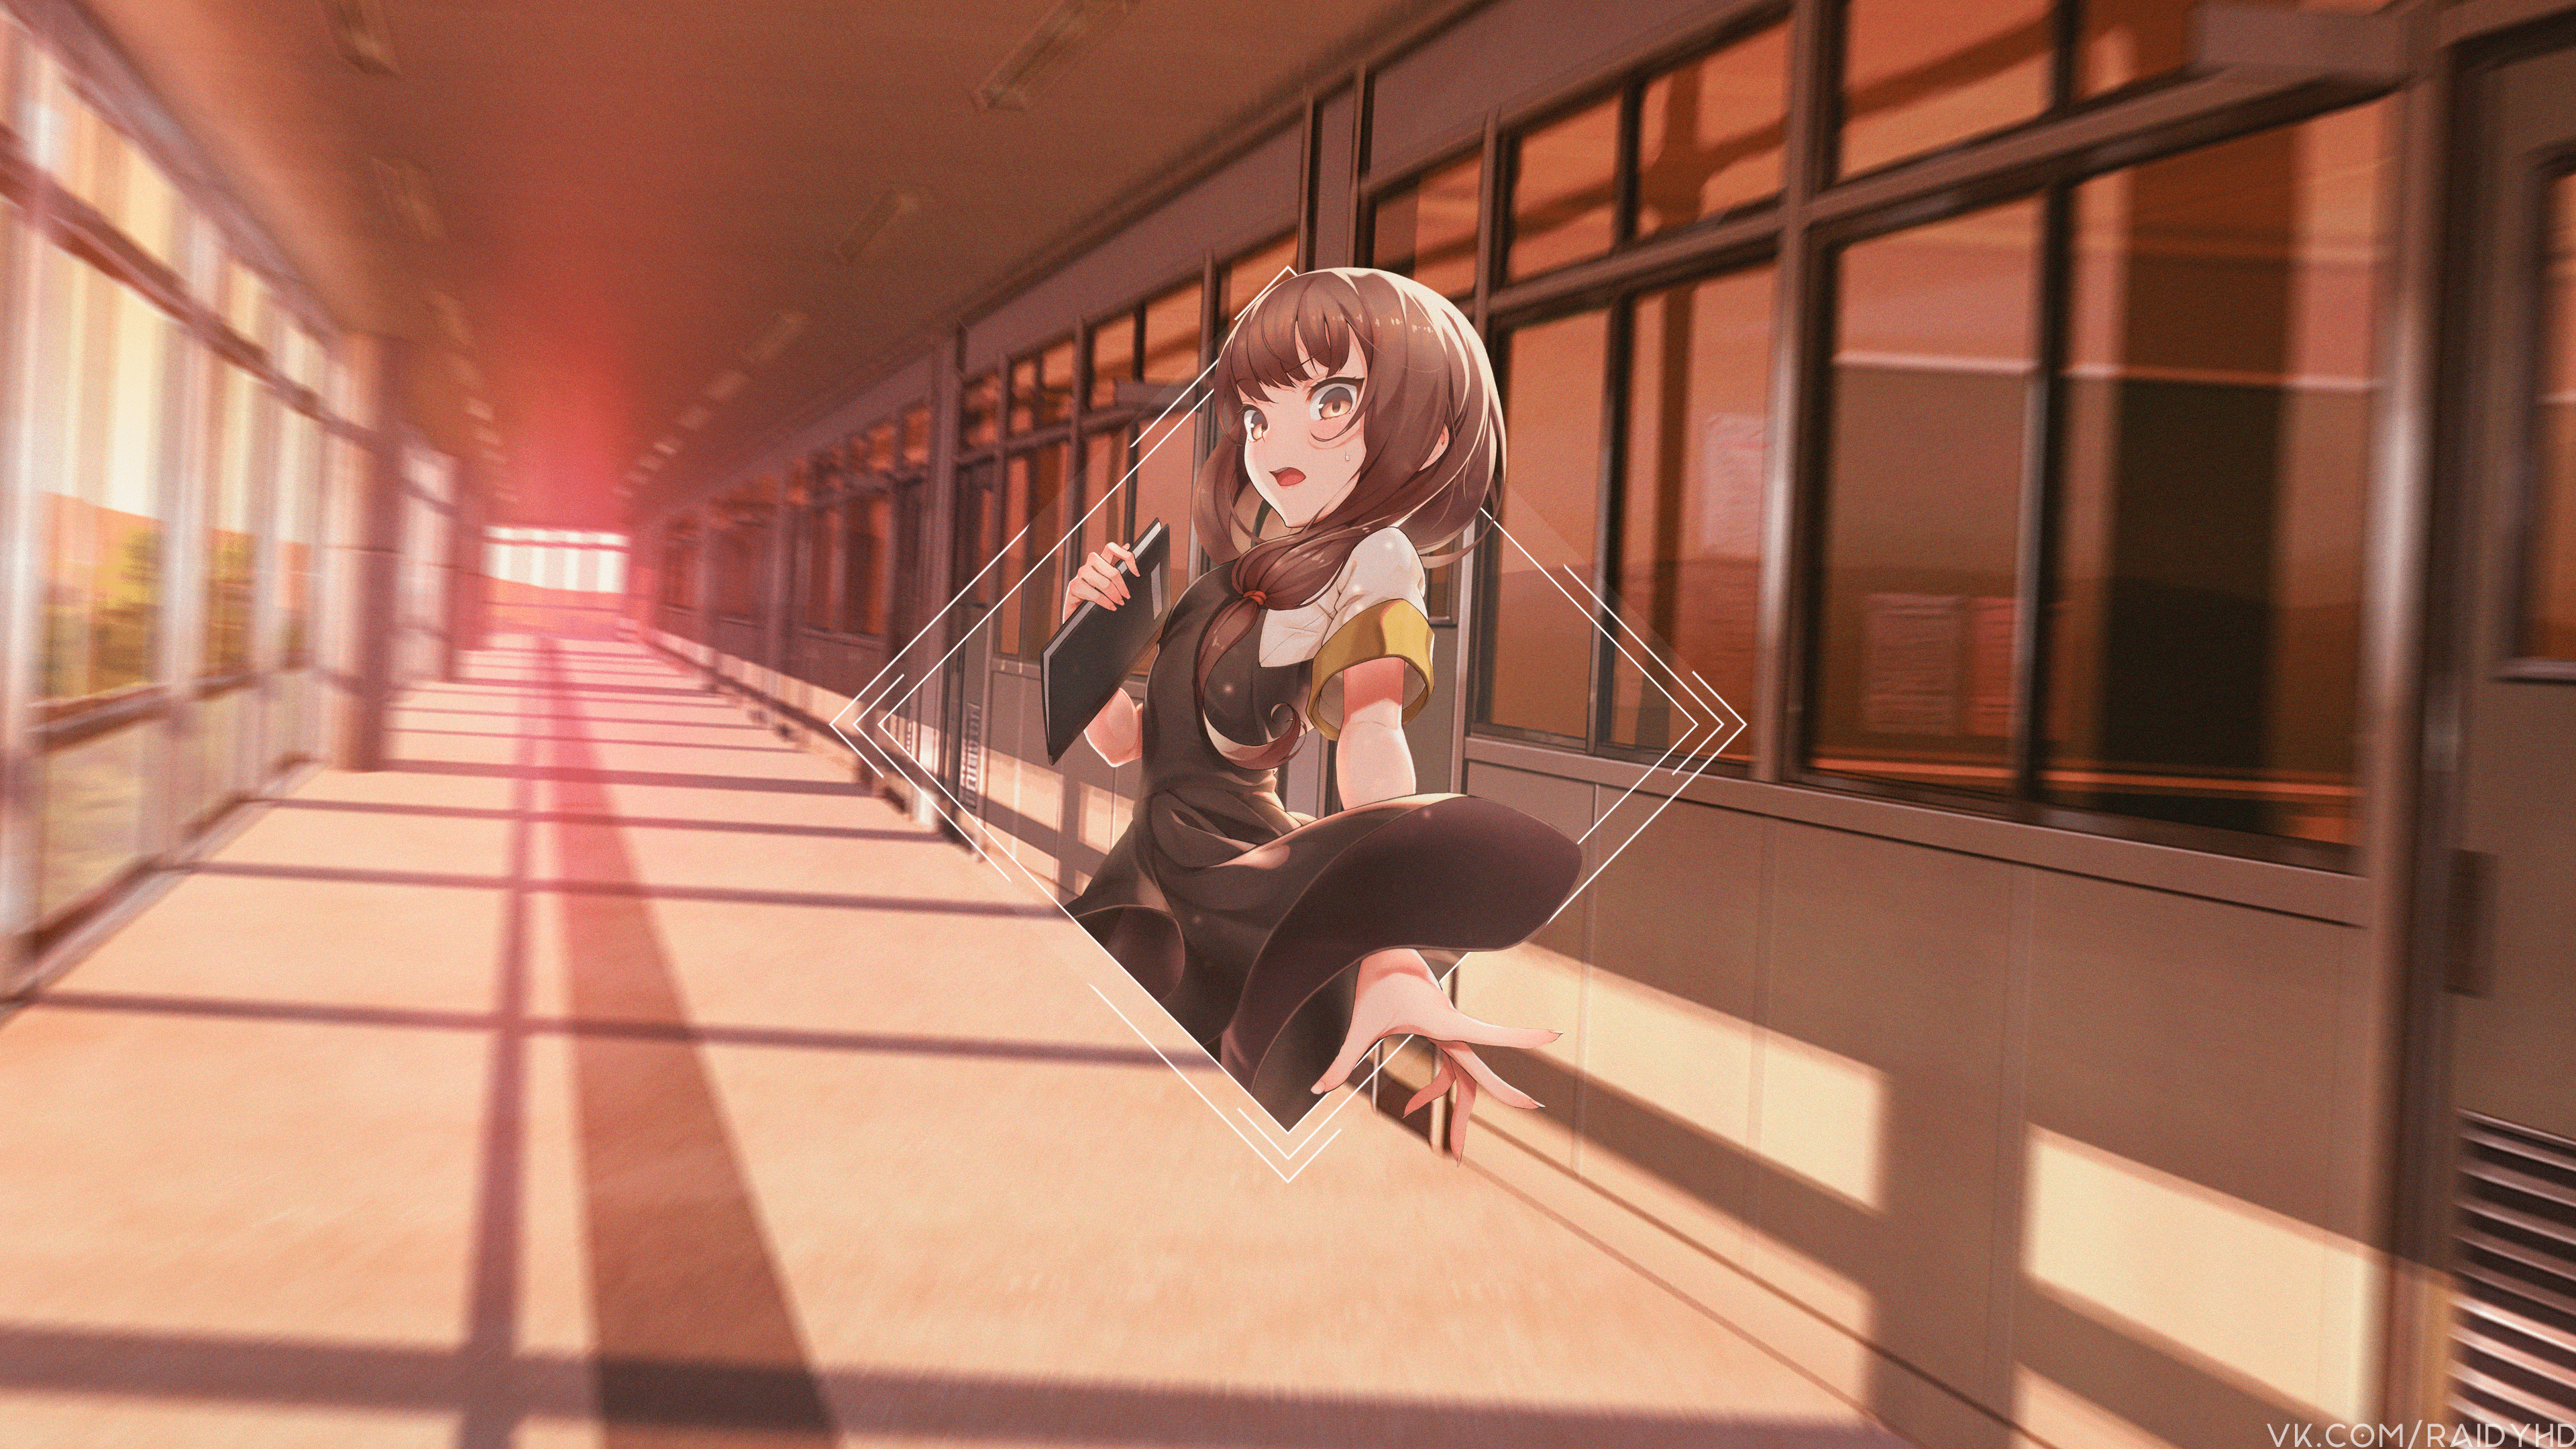 Anime 3840x2160 anime anime girls picture-in-picture Miko Iino school school uniform